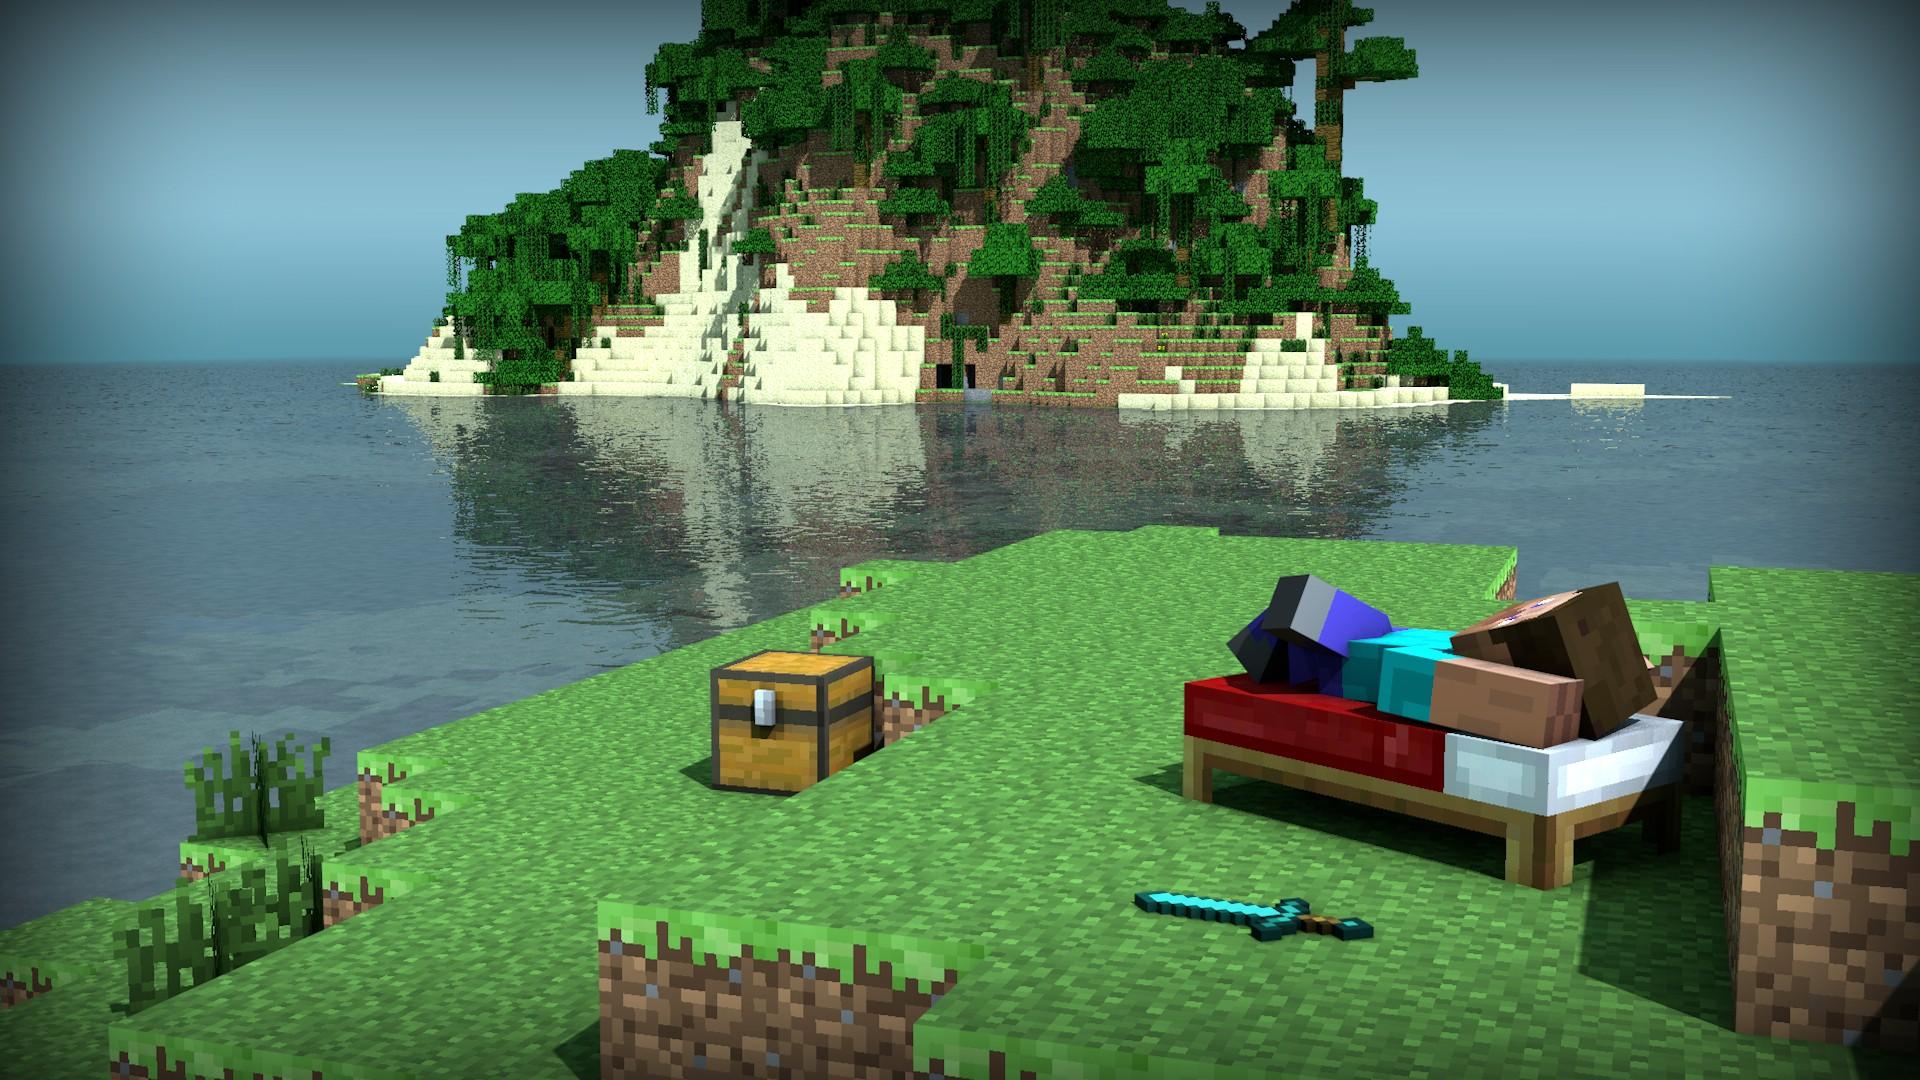 Minecraft wallpaper | 1920x1080 | #42899